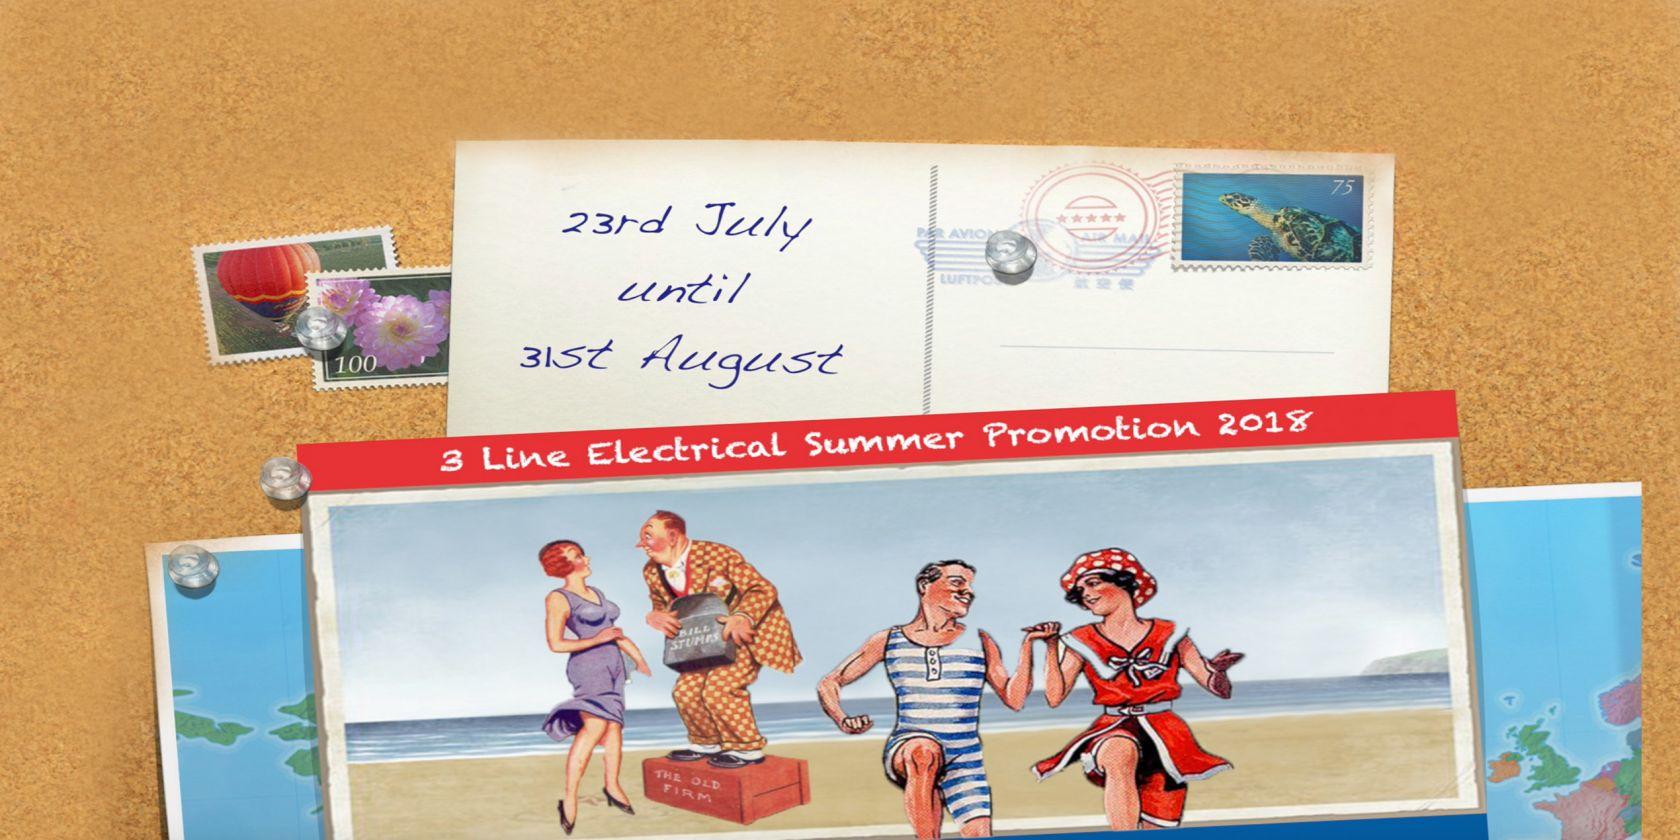 Summer Promo Image